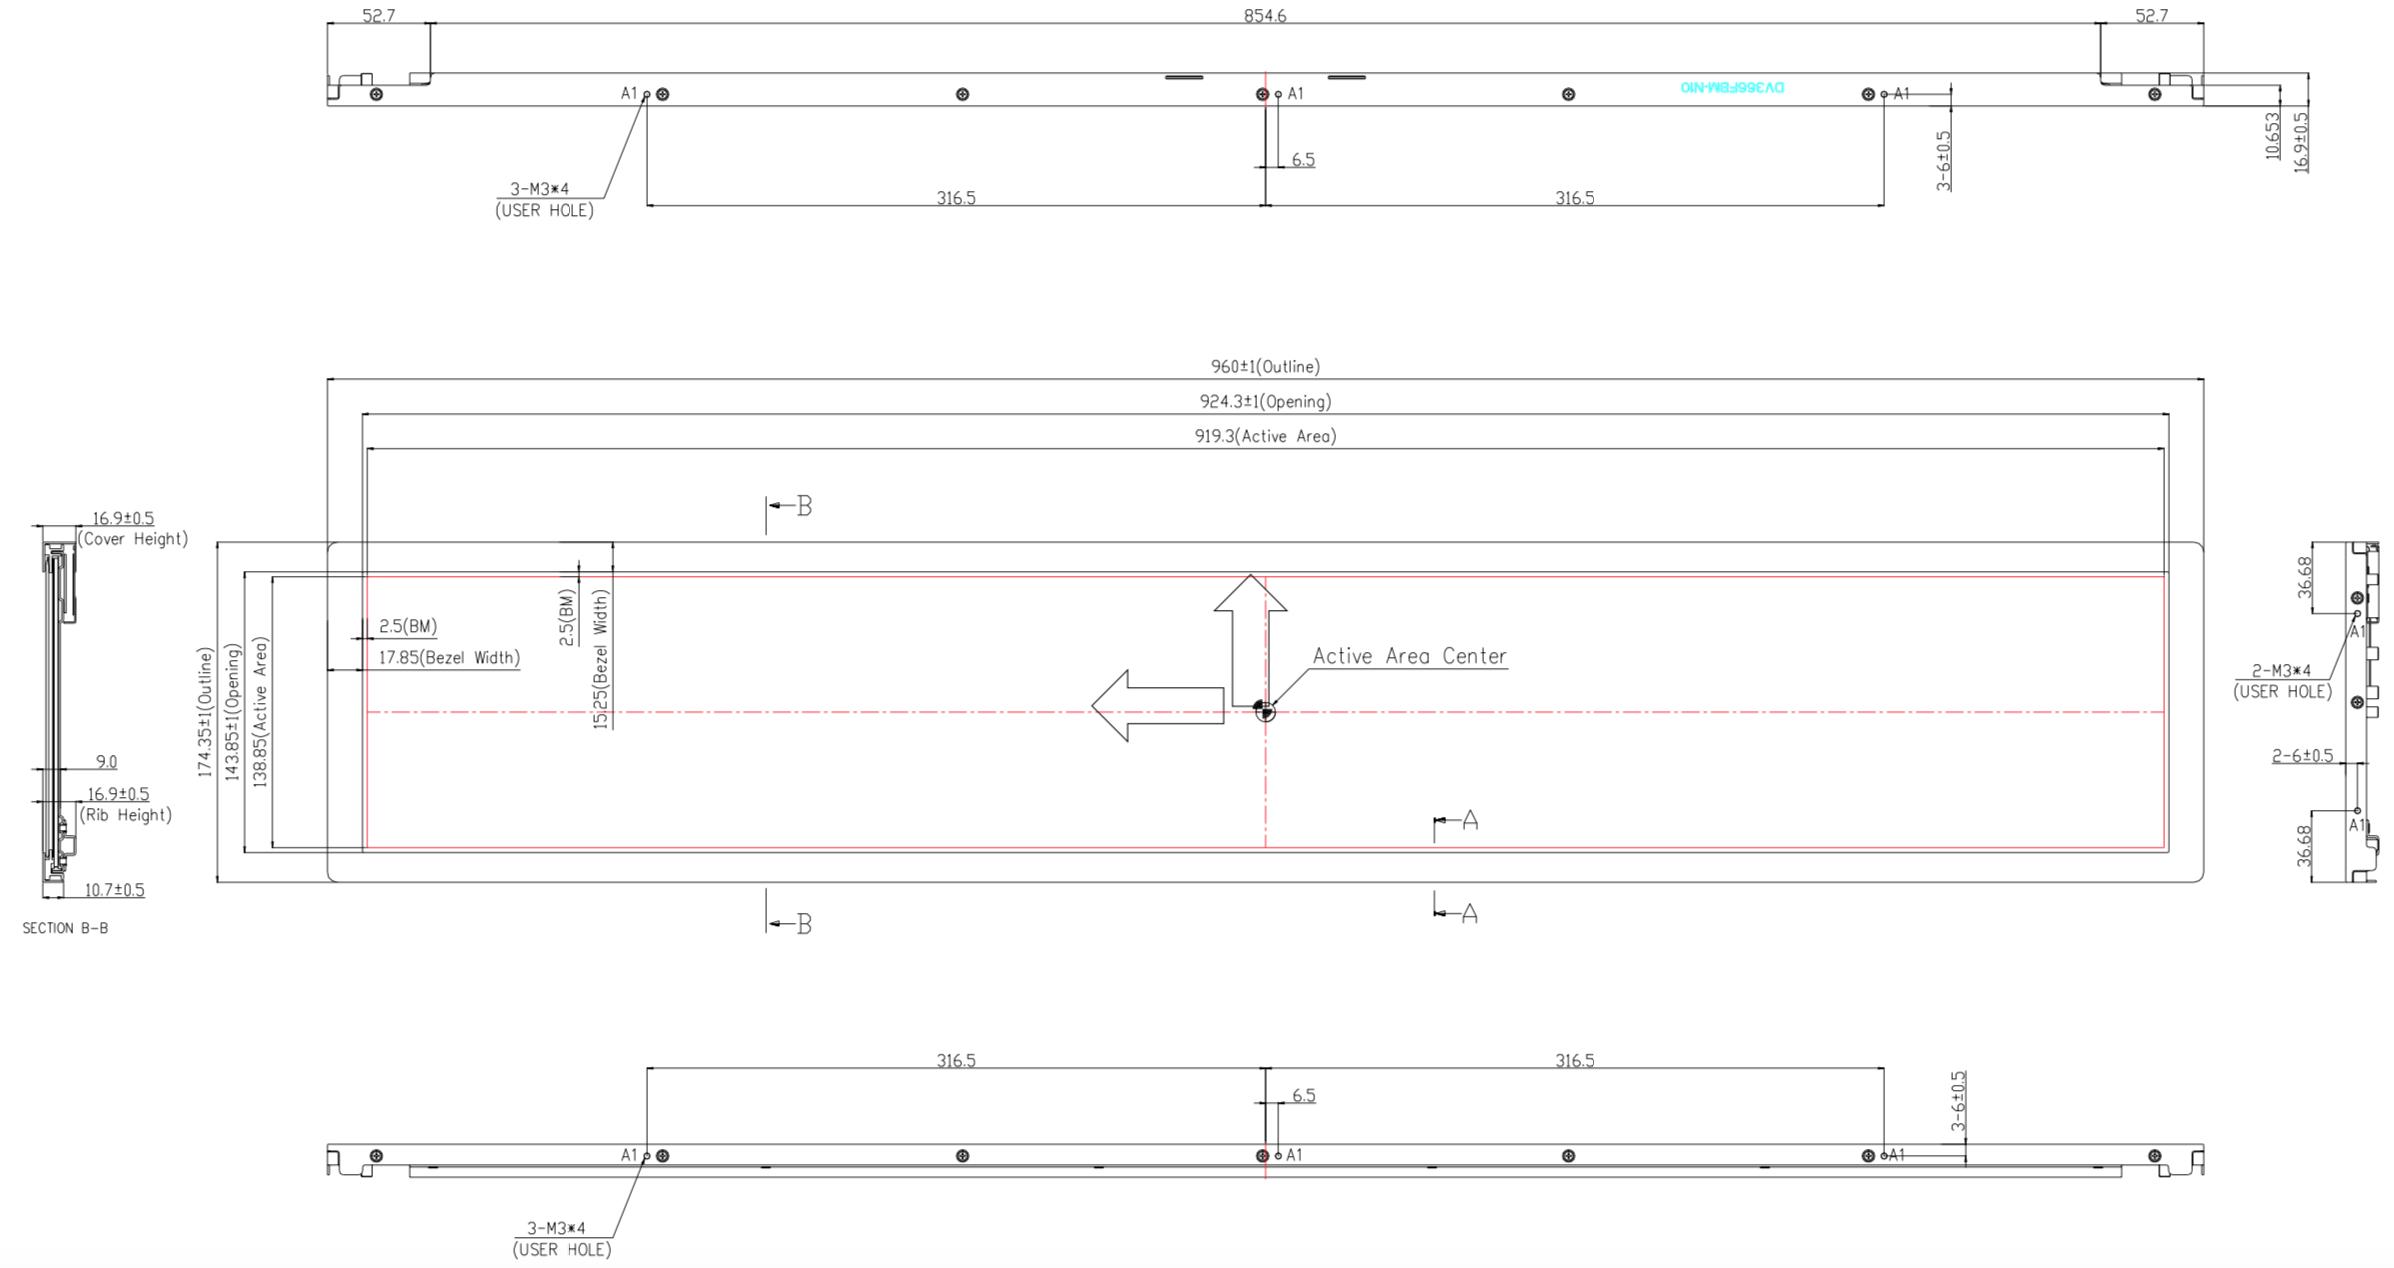 DV366FBM-N10 2D Drawing